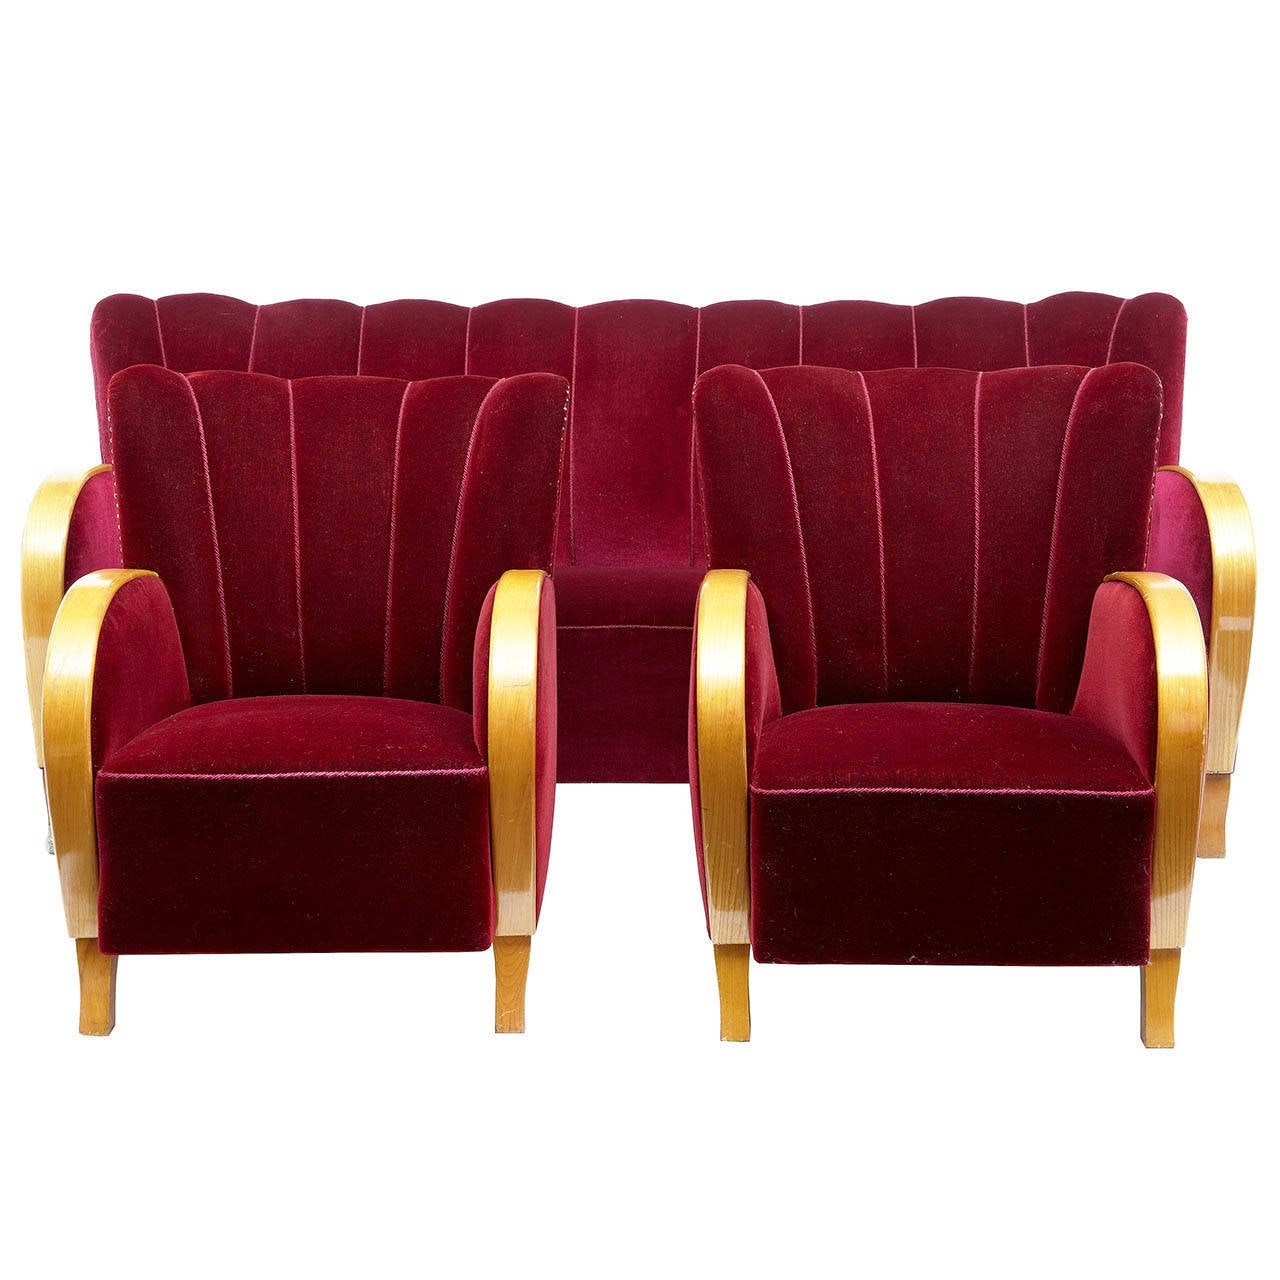 1960s retro modern shell back three piece suite of sofa for Retro modern furniture